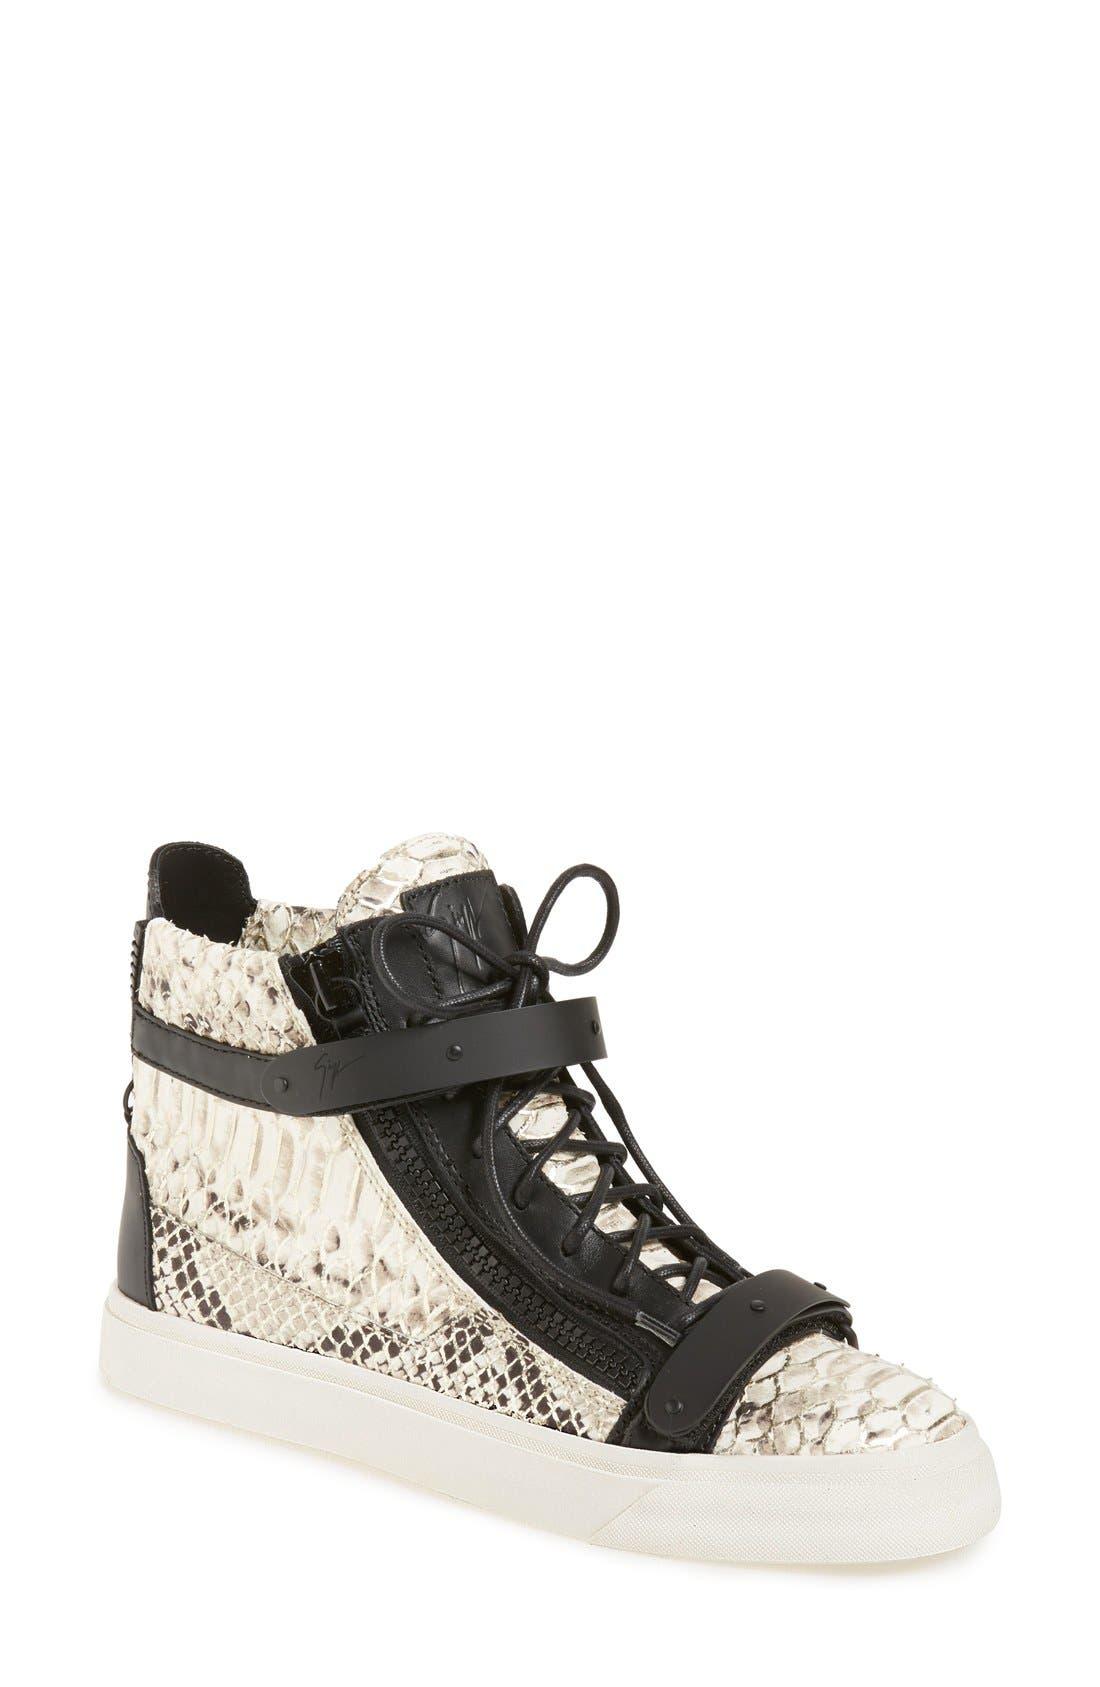 Alternate Image 1 Selected - Giuseppe Zanotti 'London' High Top Sneaker (Women)